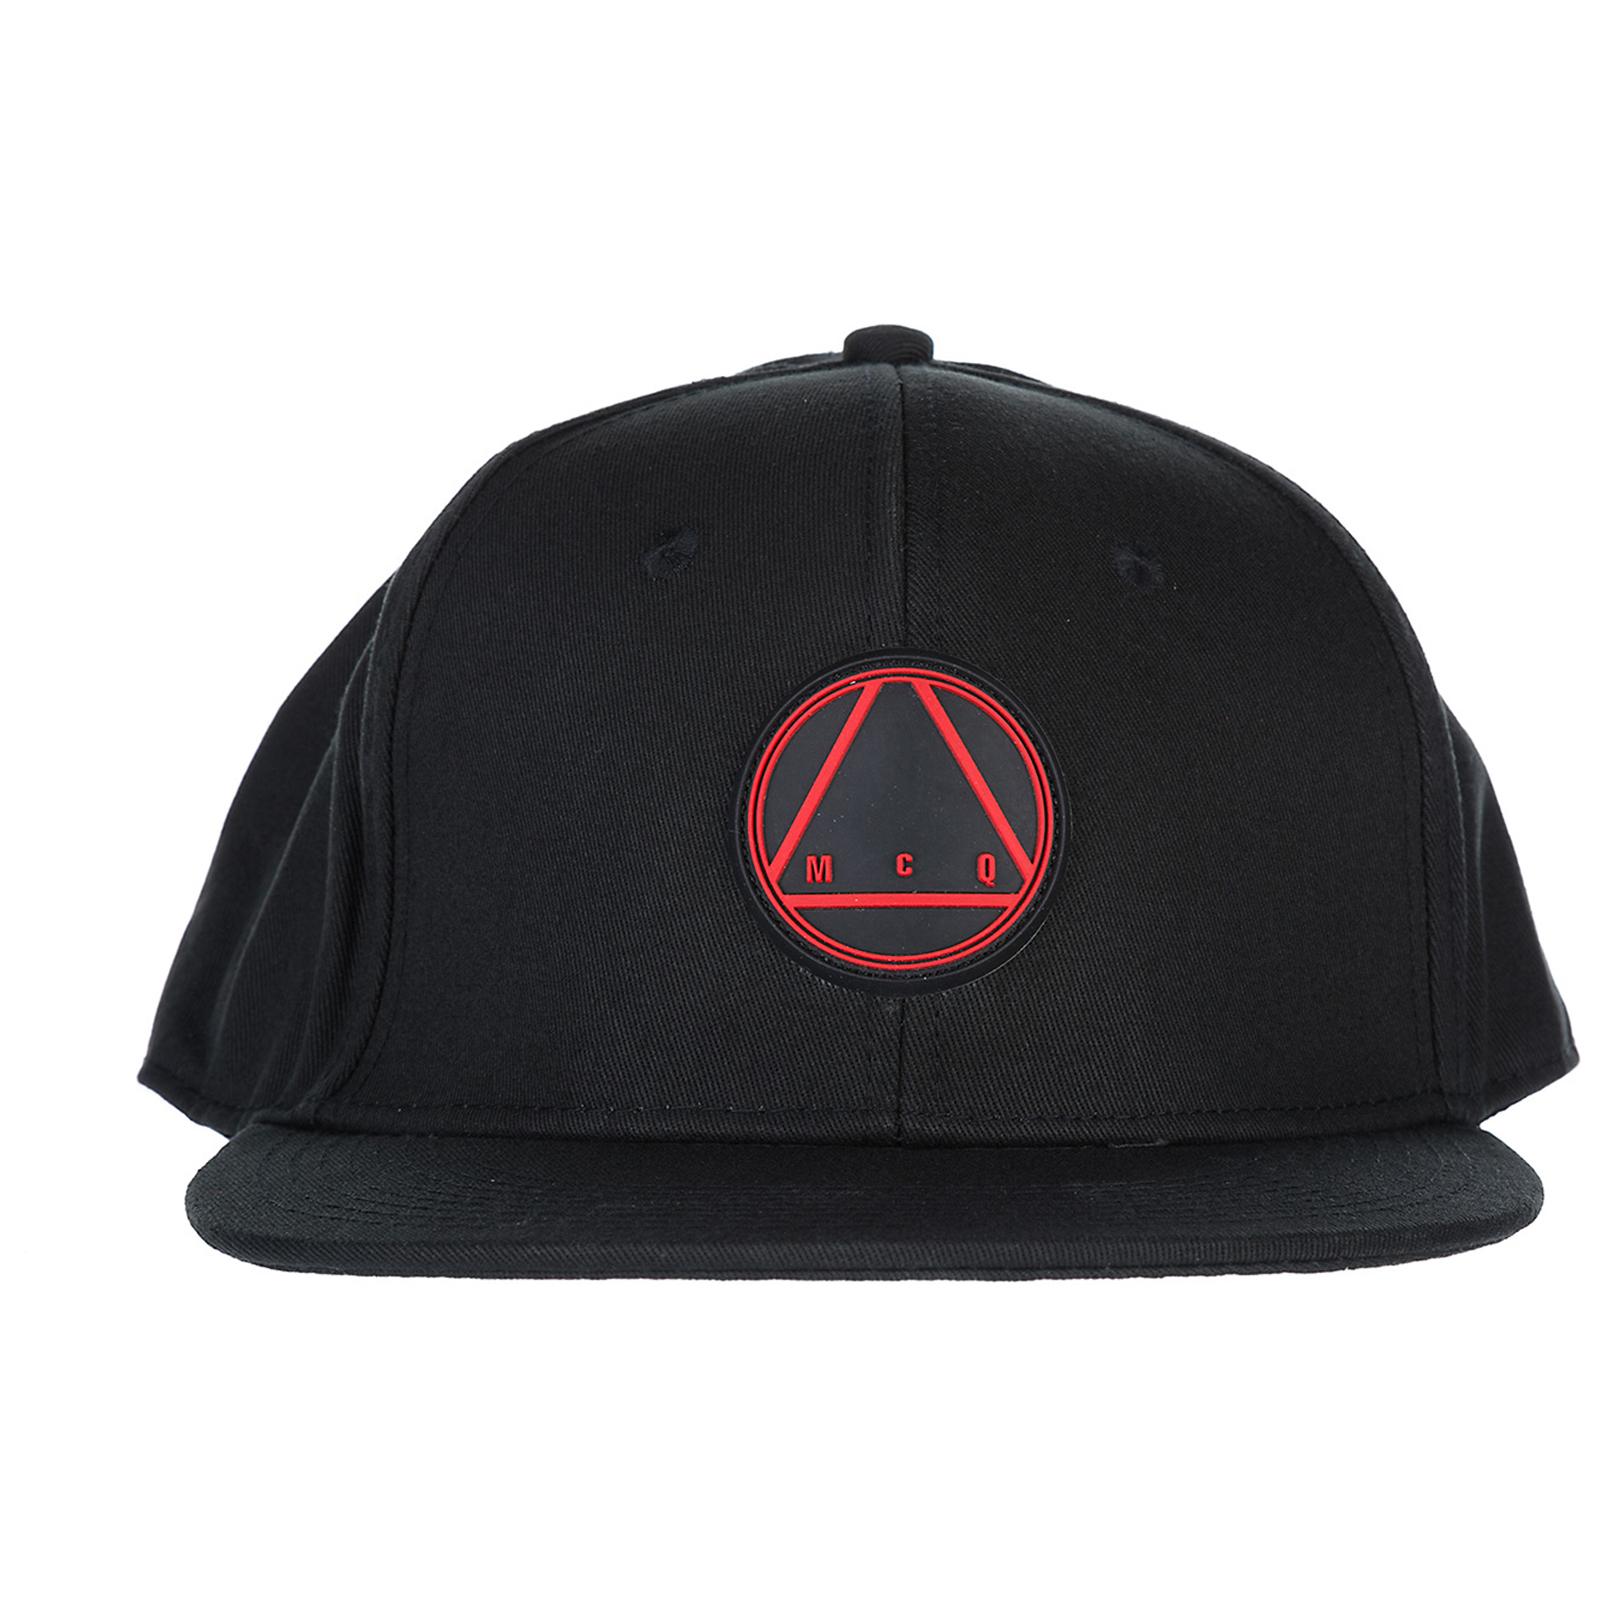 4f30b3ee05414 Adjustable men s cotton hat baseball cap Adjustable men s cotton hat  baseball cap ...